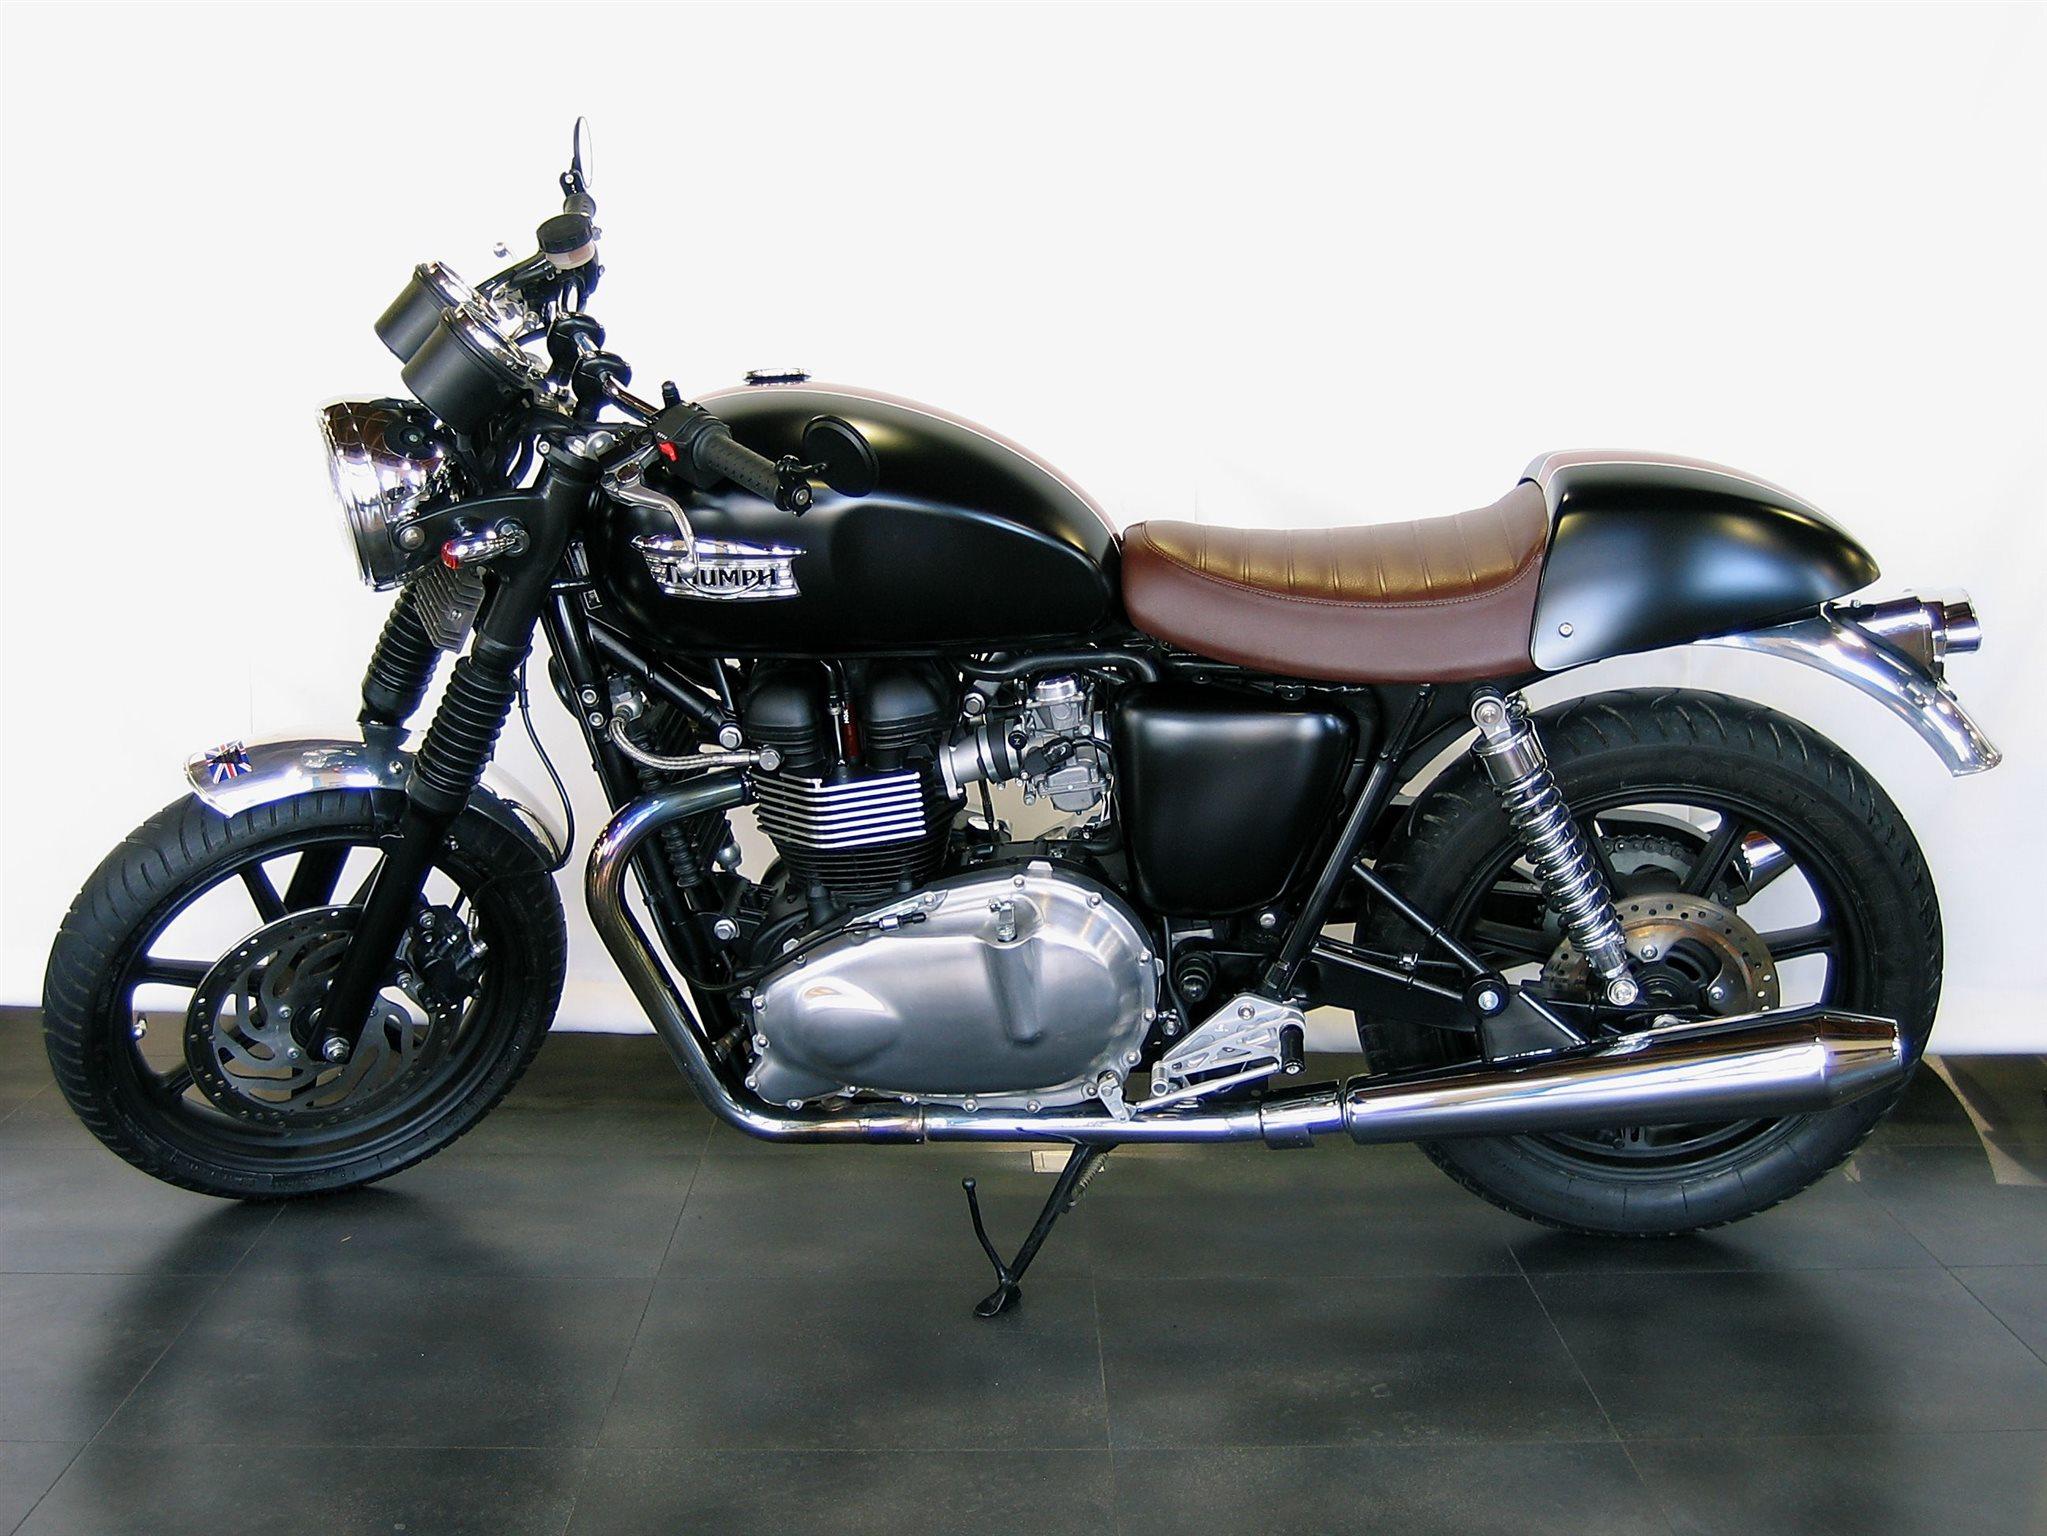 umgebautes motorrad triumph bonneville von sbf triumph. Black Bedroom Furniture Sets. Home Design Ideas